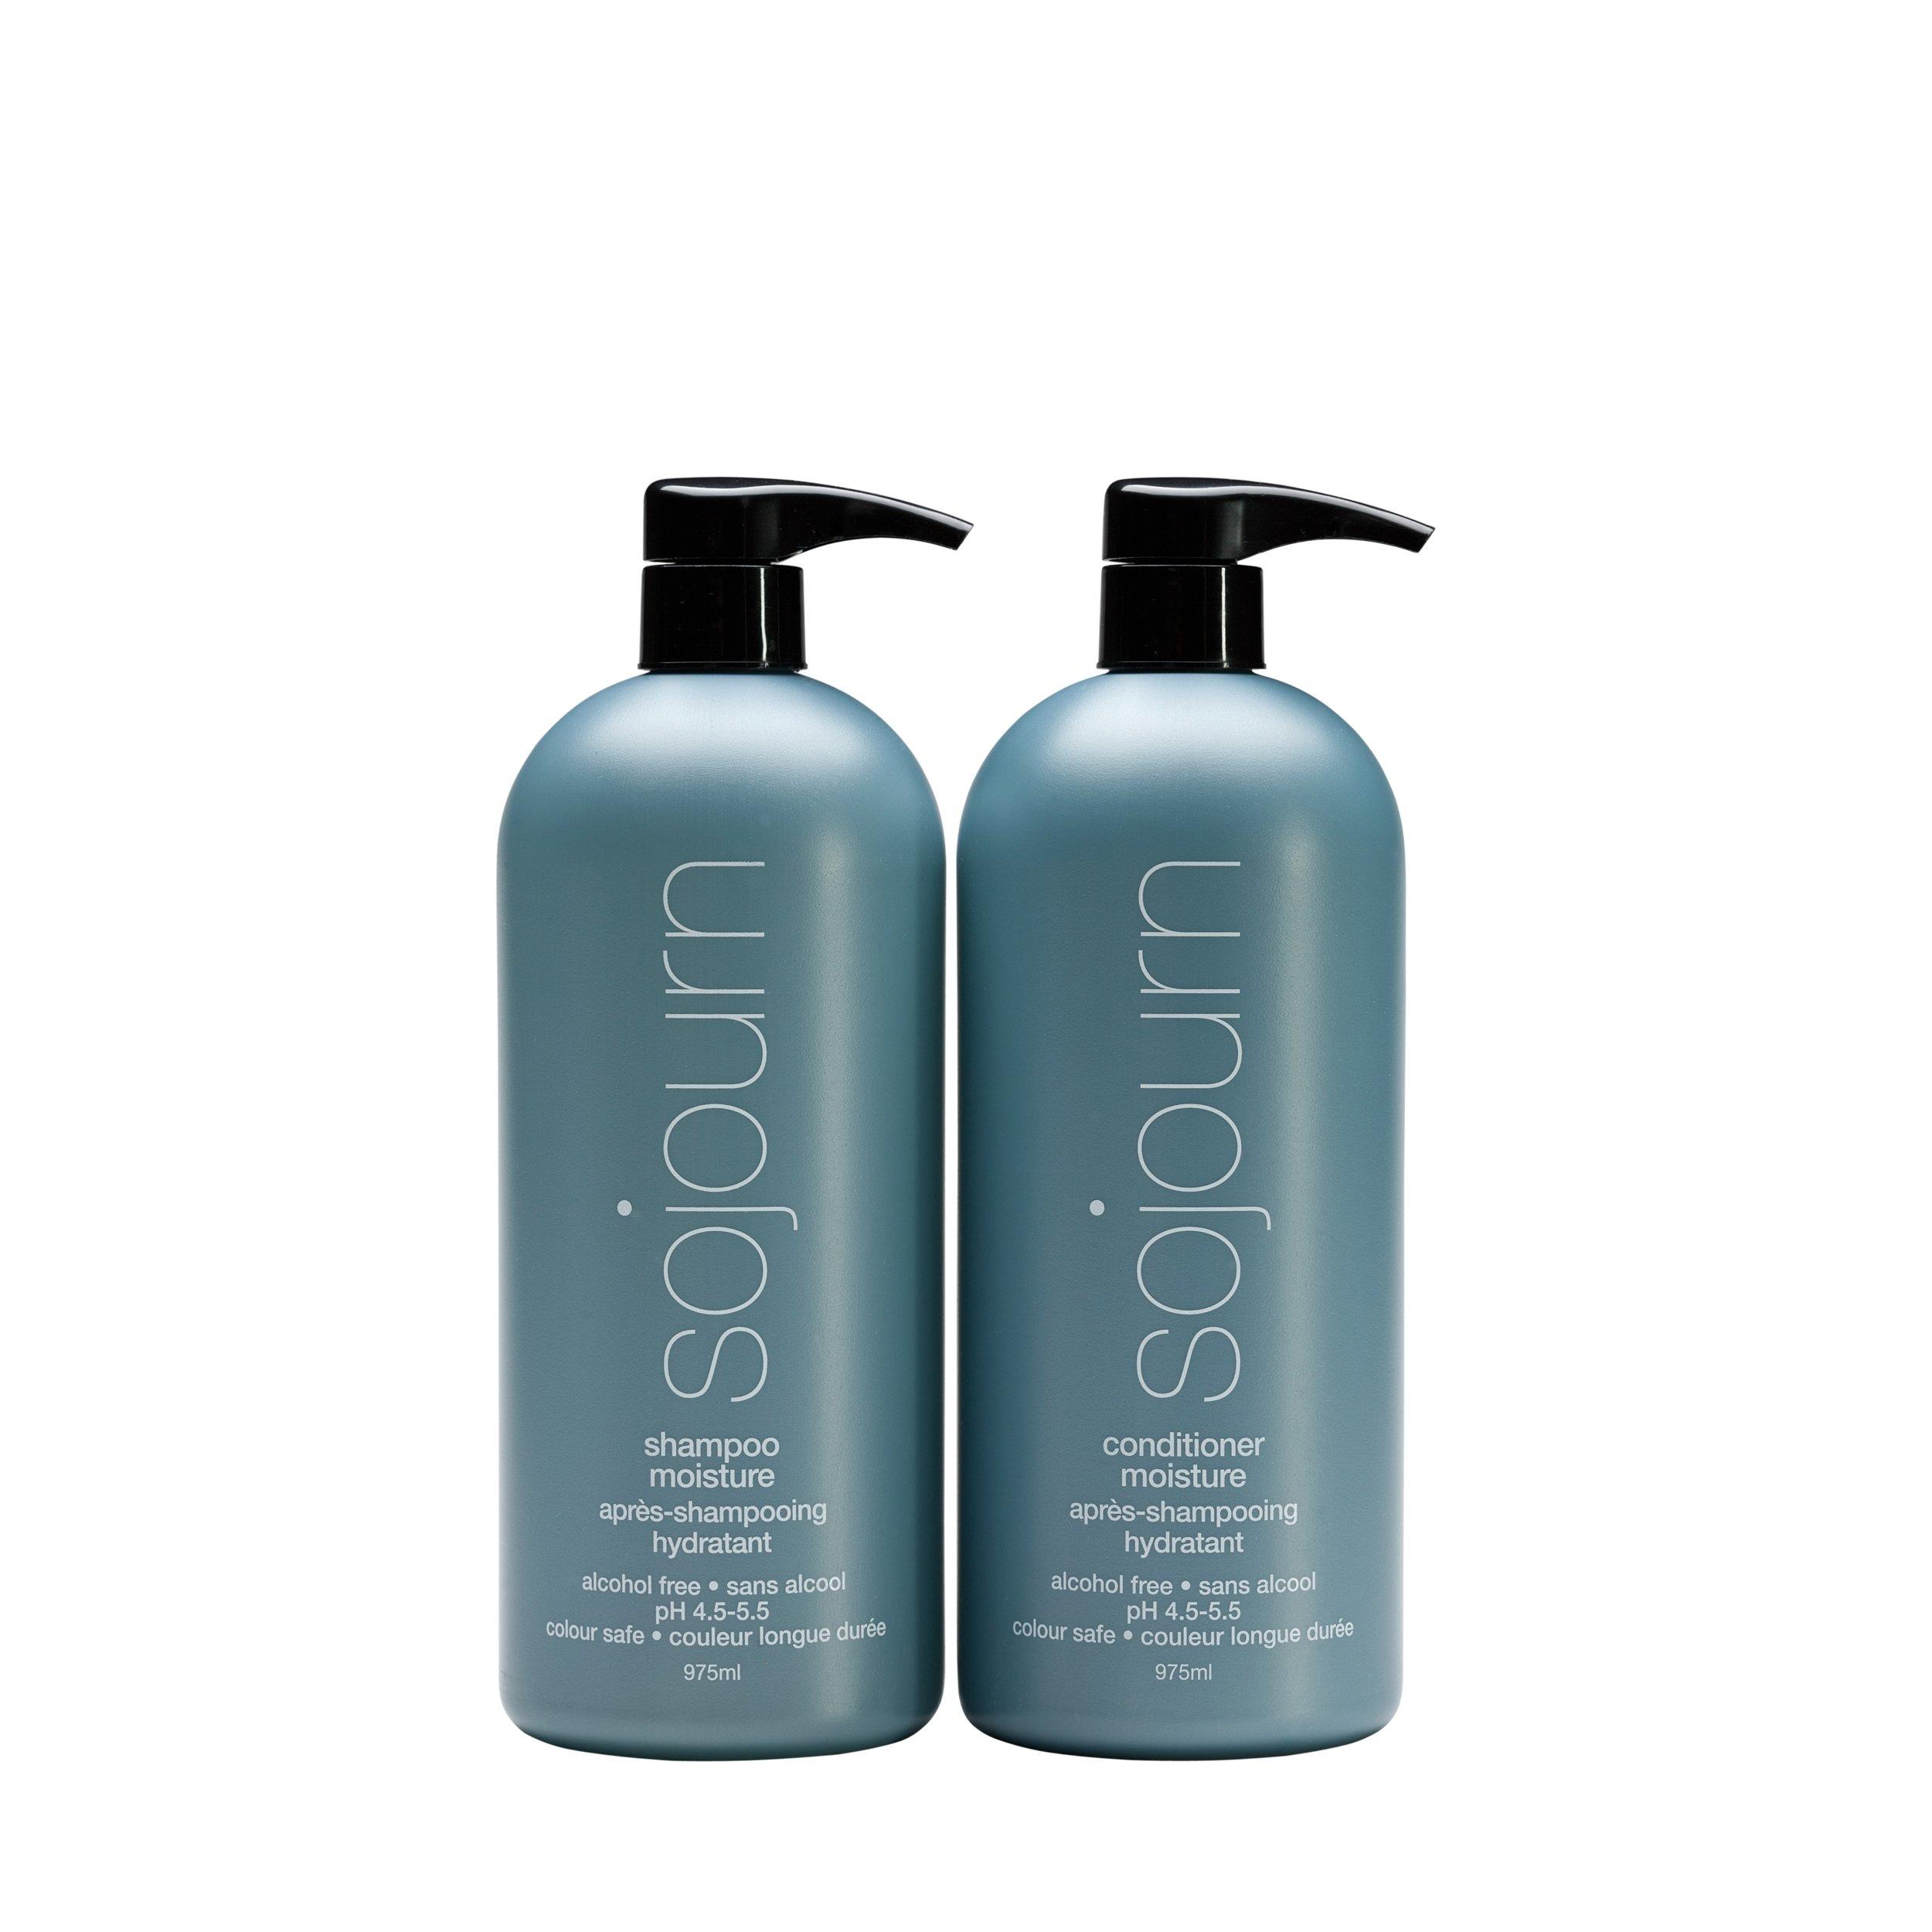 Sojourn Moisture Organic Shampoo and Conditioner 33 oz 975ml